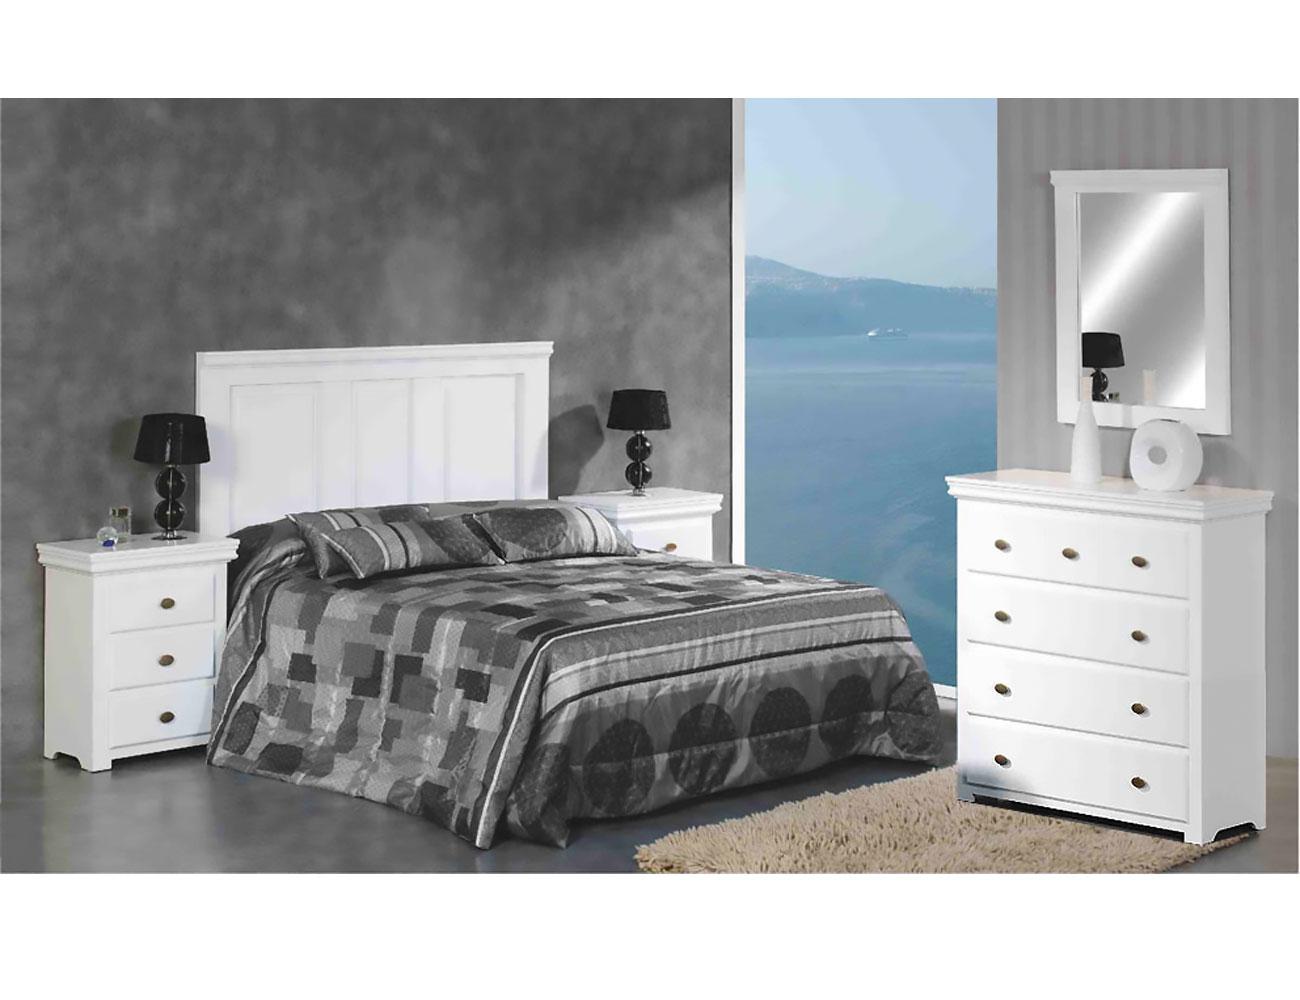 Dormitorio matrimonio comoda 5 c madera dm lacado blanco1